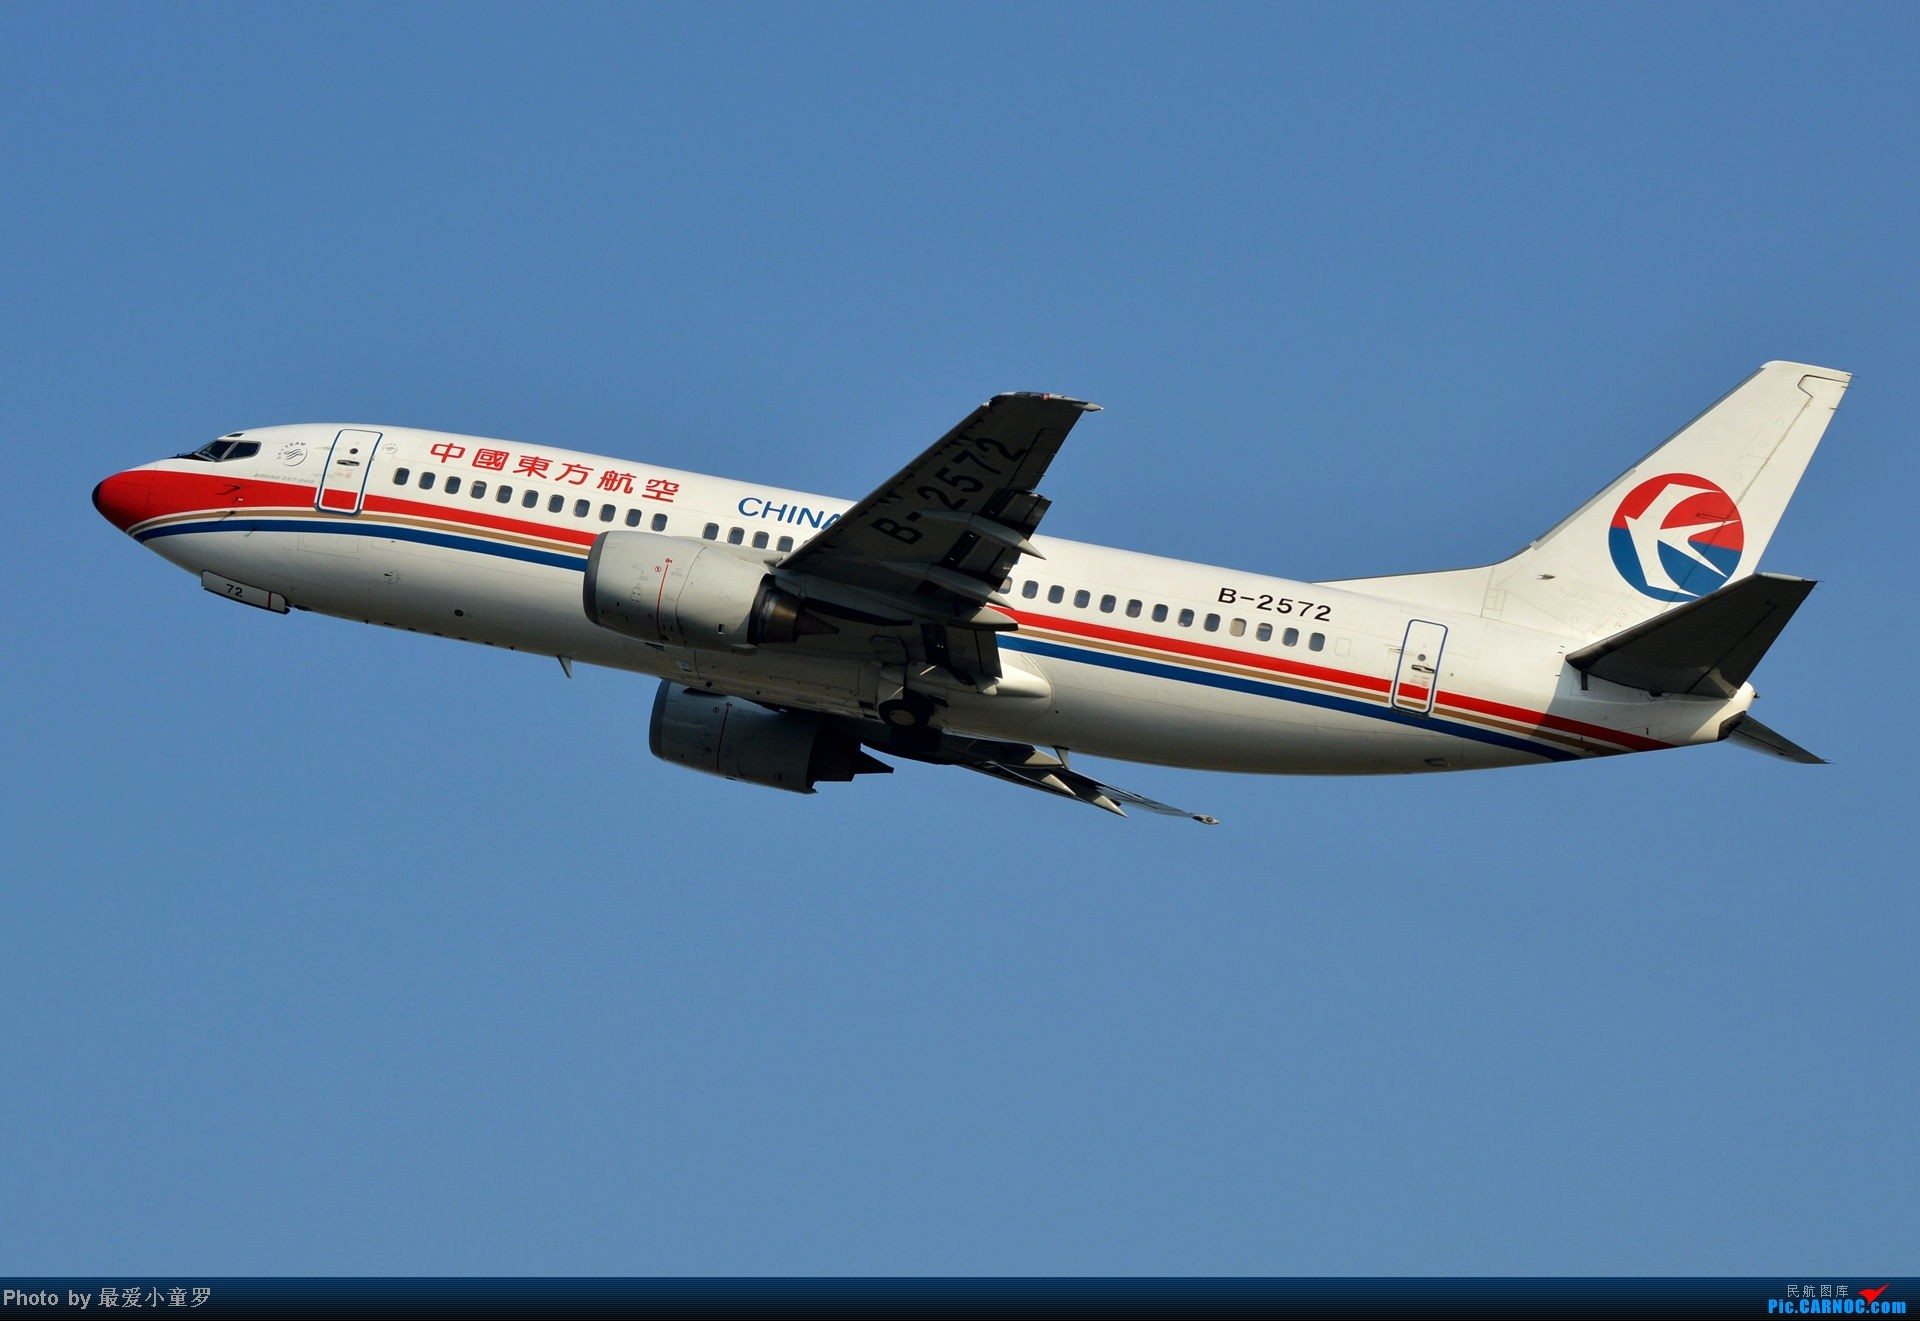 Re:[原创]老图系列,13年11月15日广州白云机场西跑拍机 BOEING 737-300 B-2572 中国广州白云机场